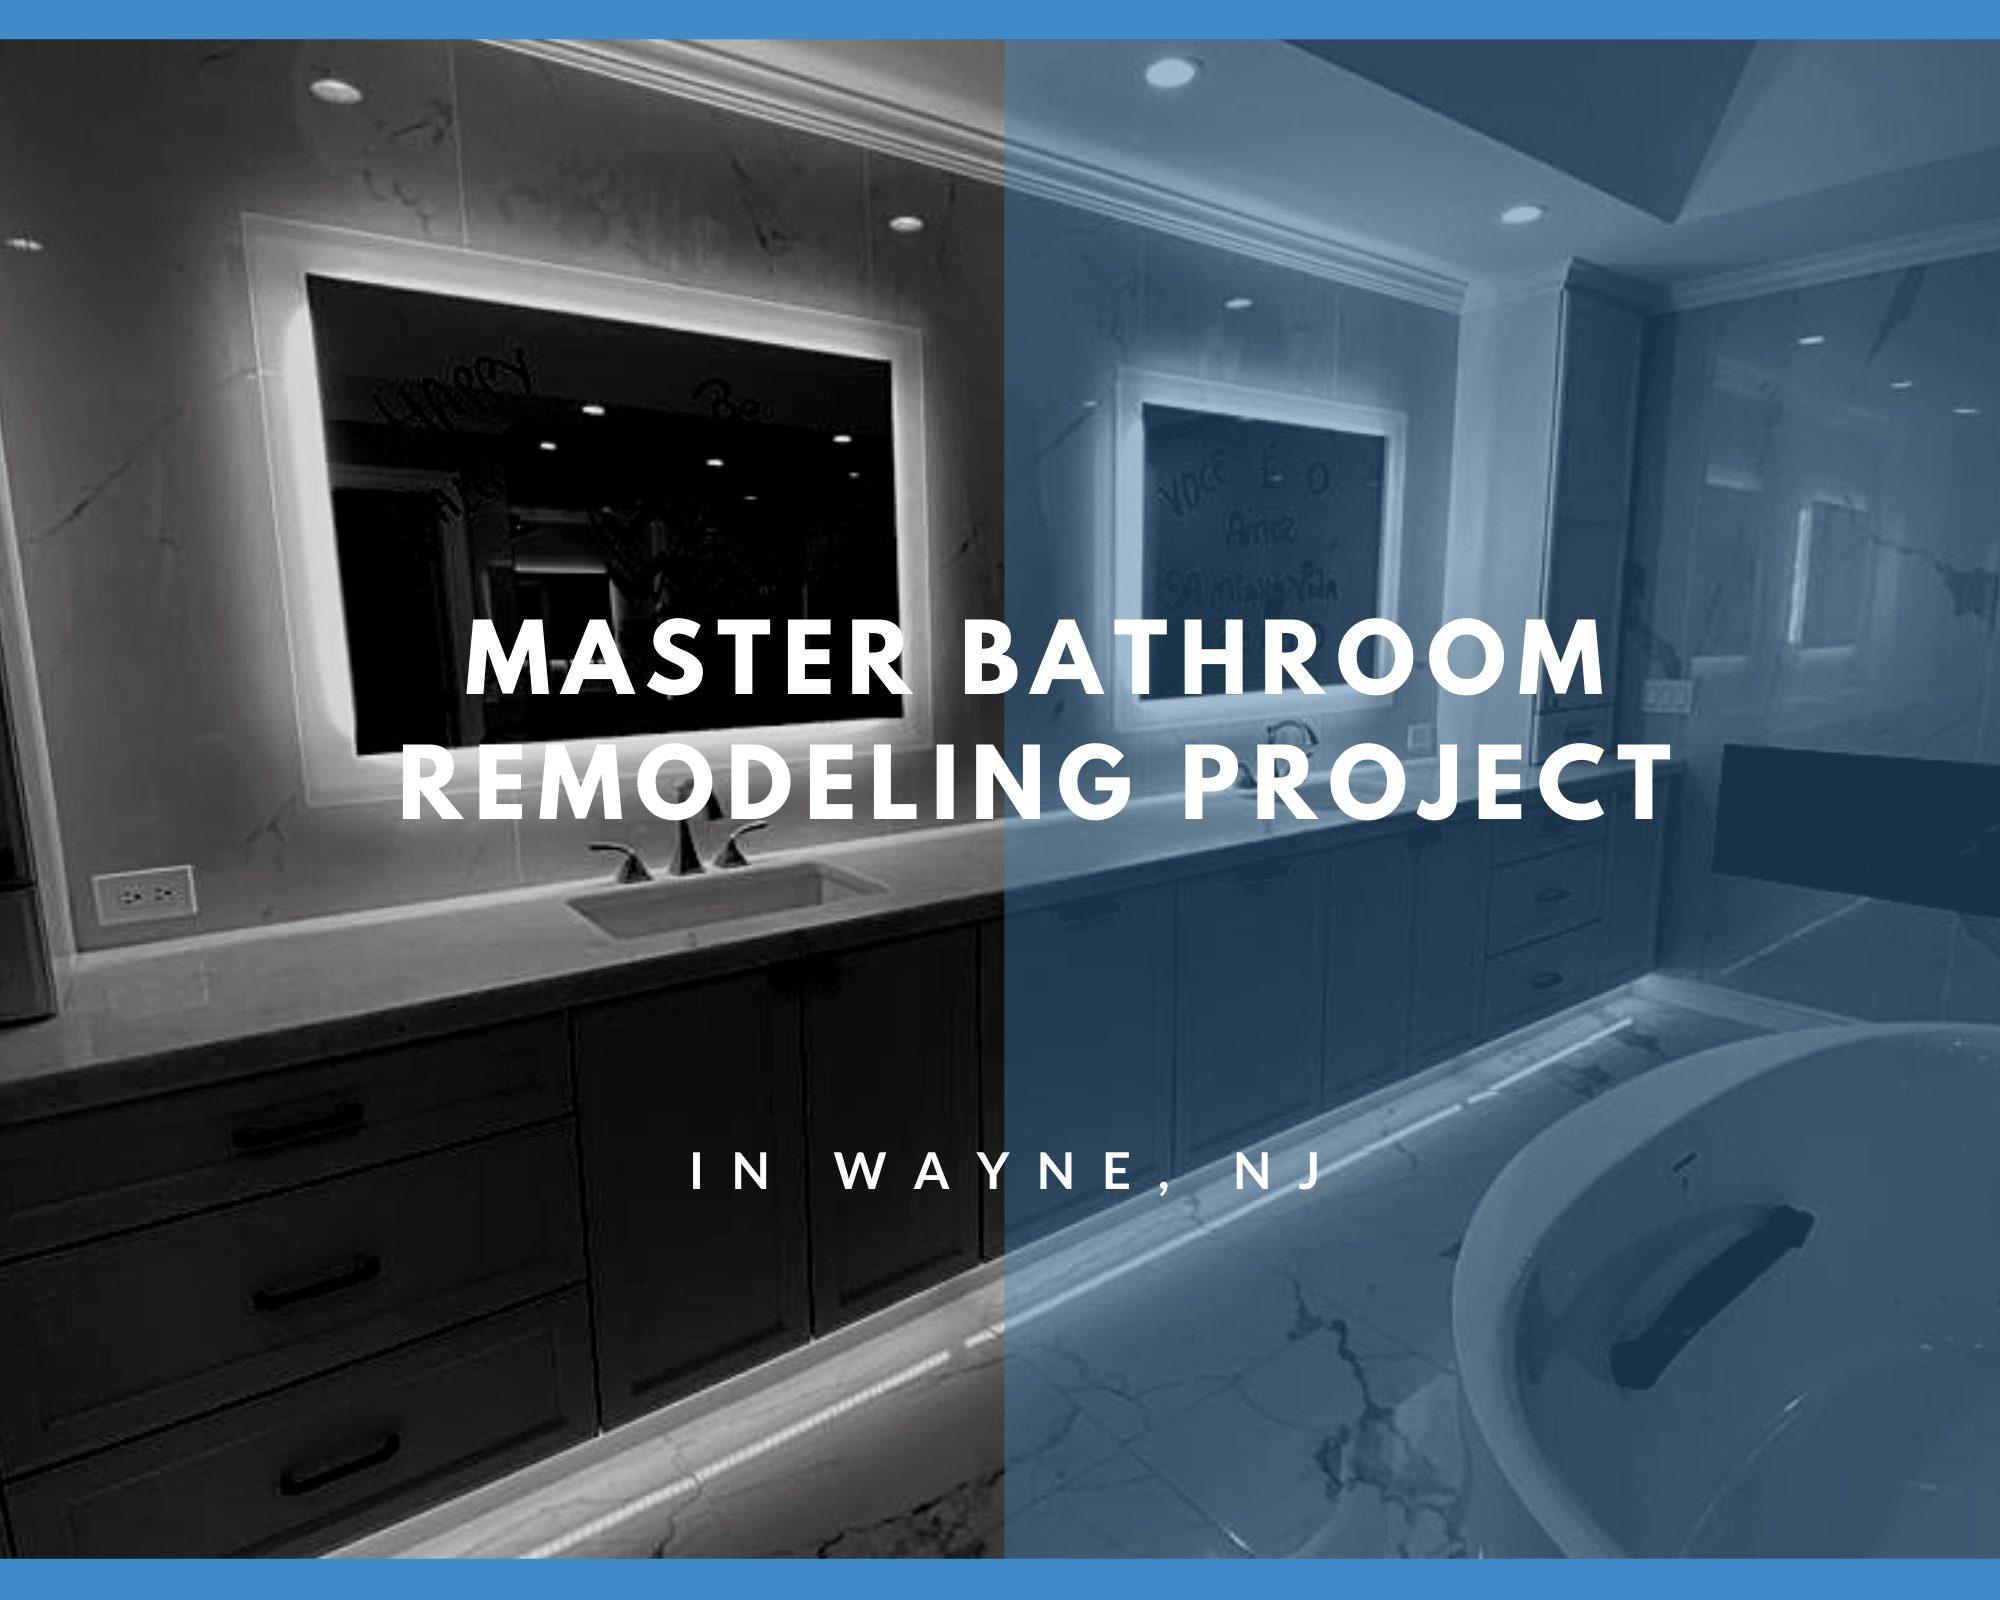 Master Bathroom Remodeling Project in Wayne, NJ